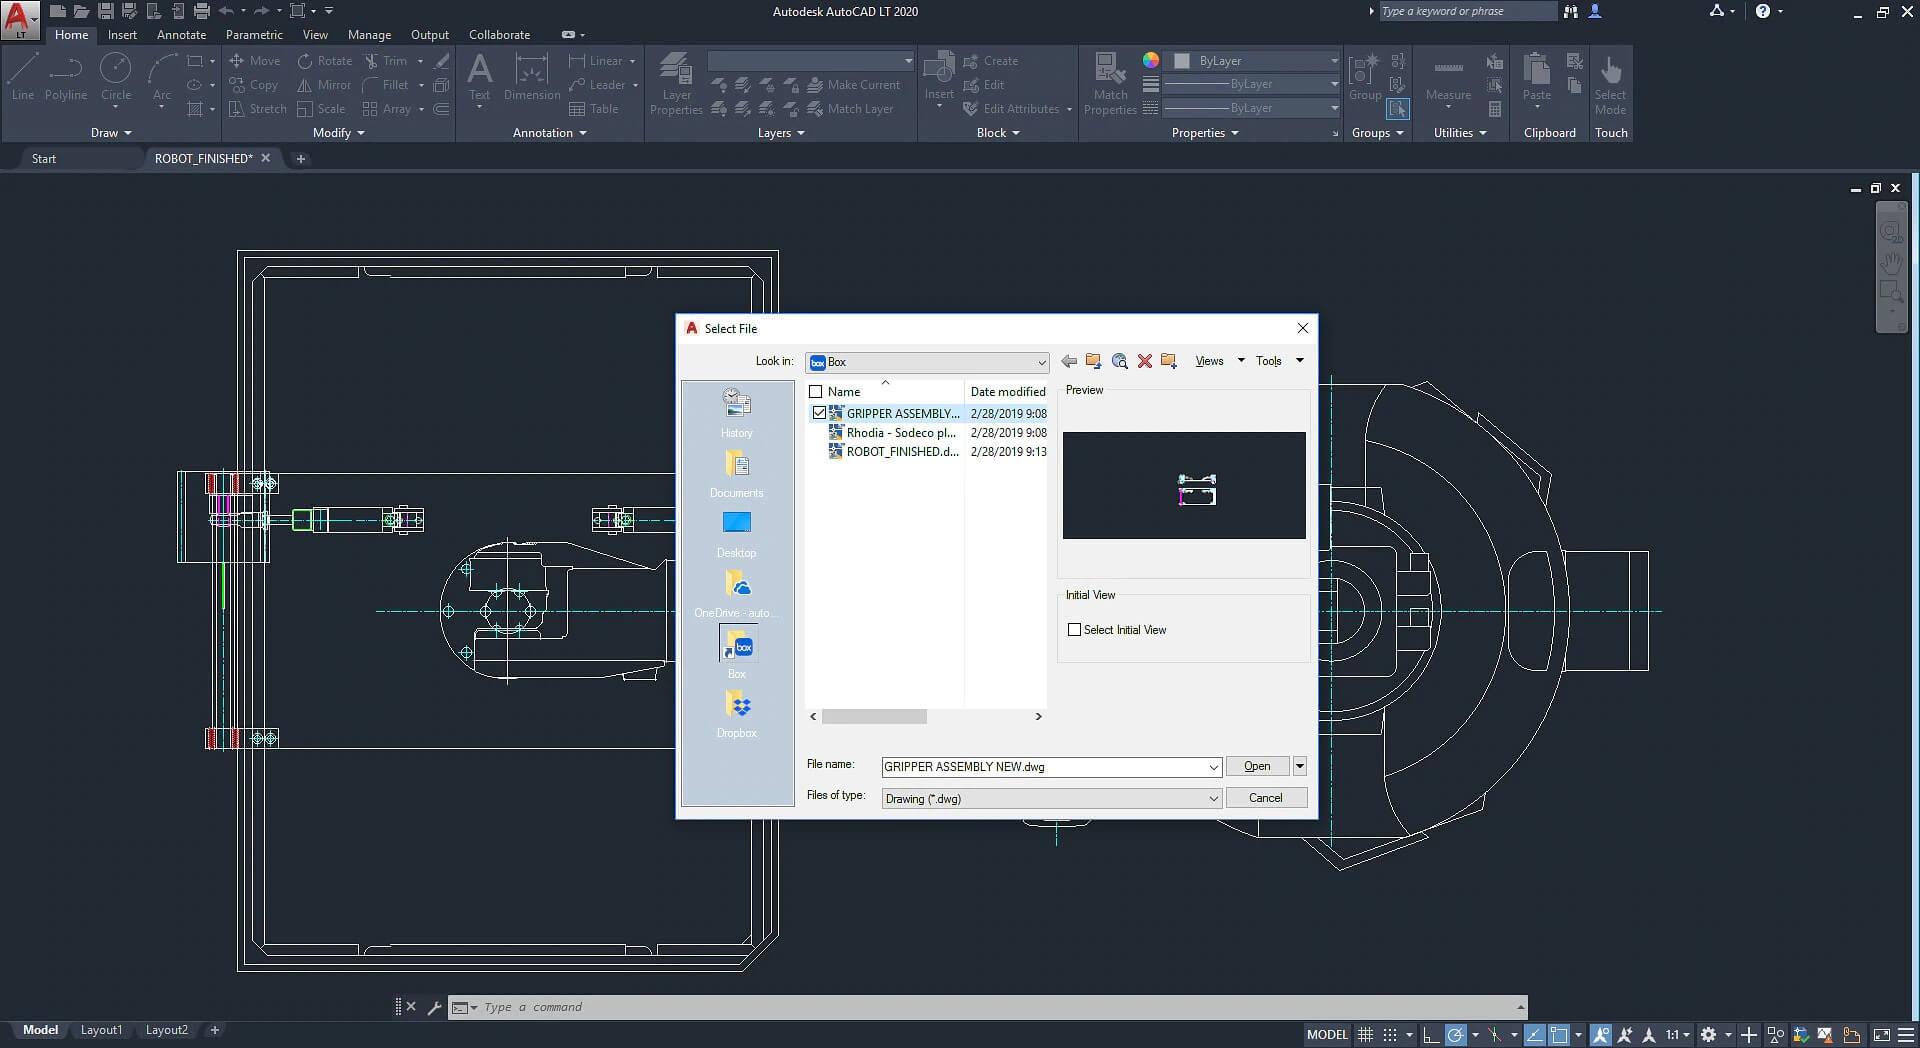 AutoCAD LT Screenshot